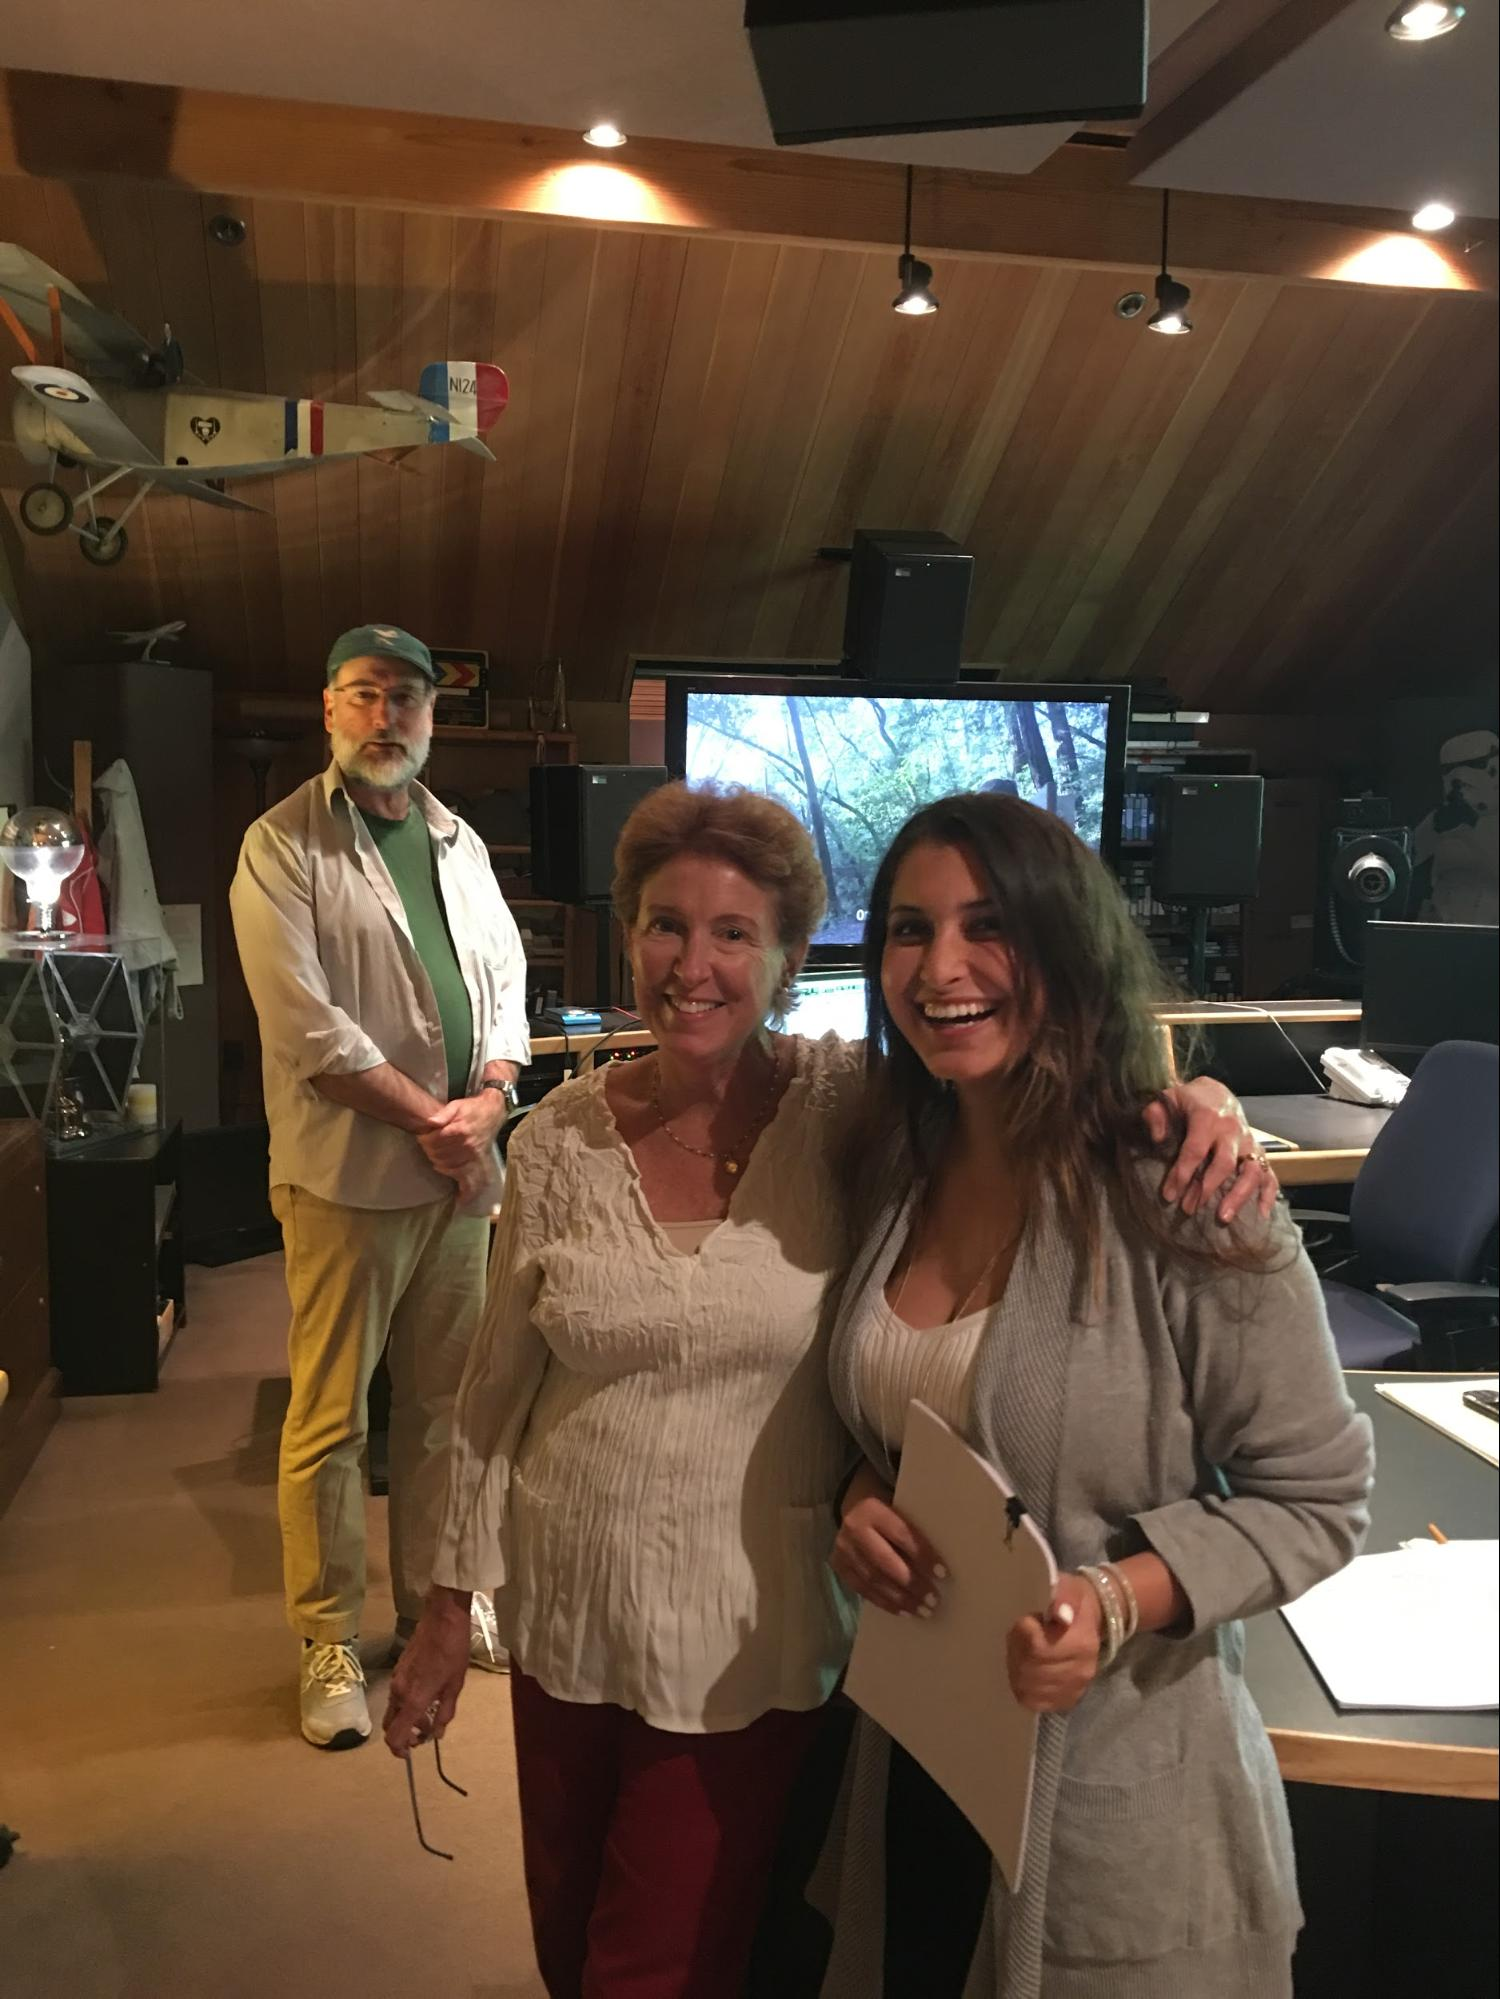 Larry Oatfield, Laurel Ladevich, Jacqueline Monetta at Skywalker Sound